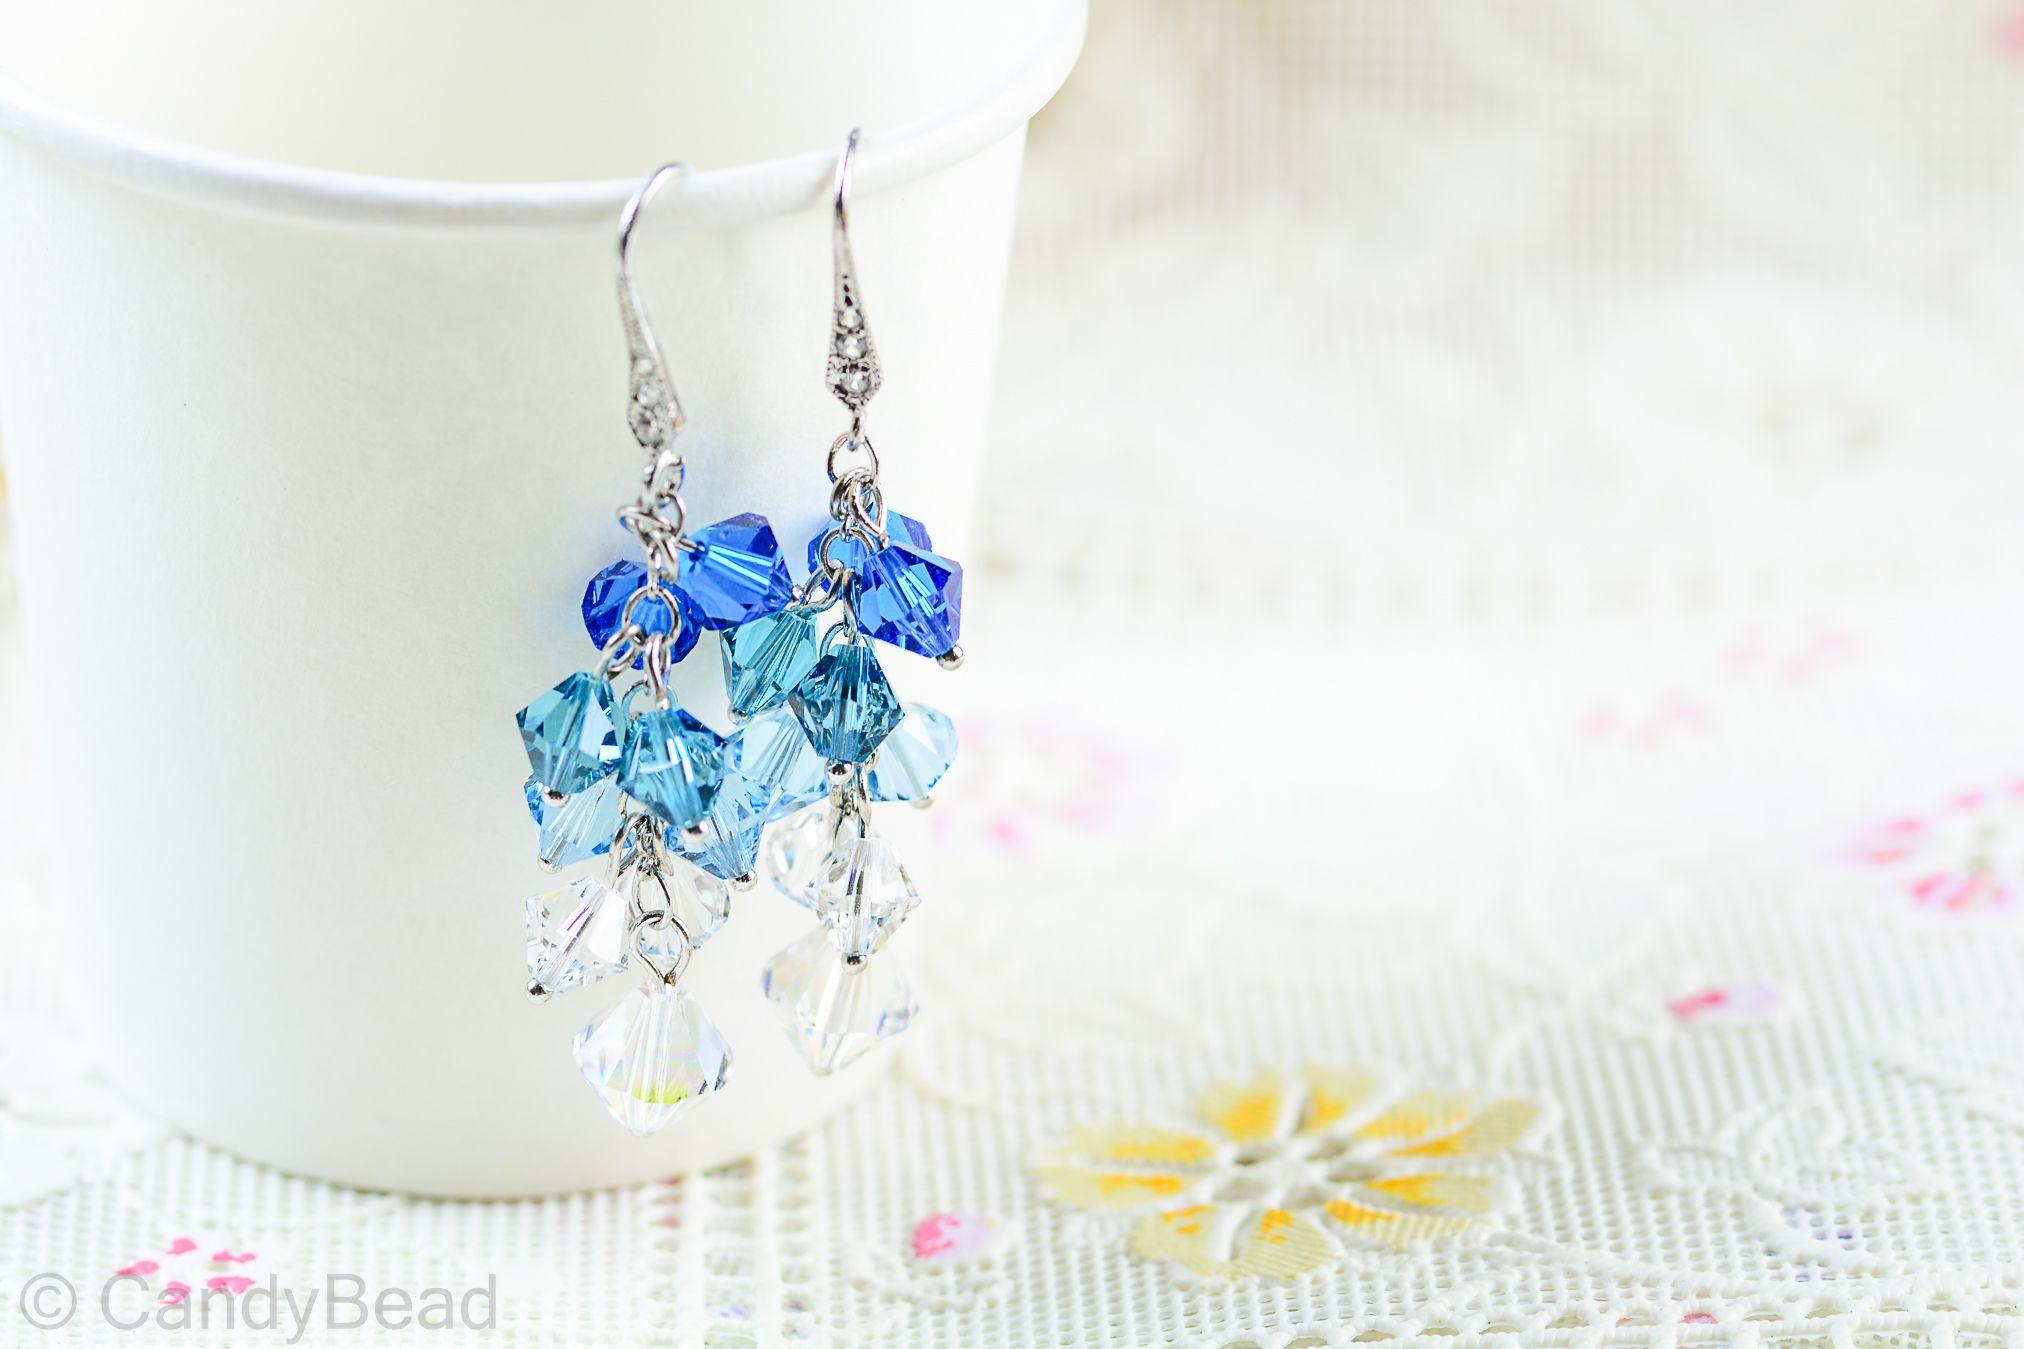 cd412c863 Swarovski earrings;crystal earrings; Blue Aquamarine Swarovski Crystal by  CandyBead by candybead, $15.19 USD